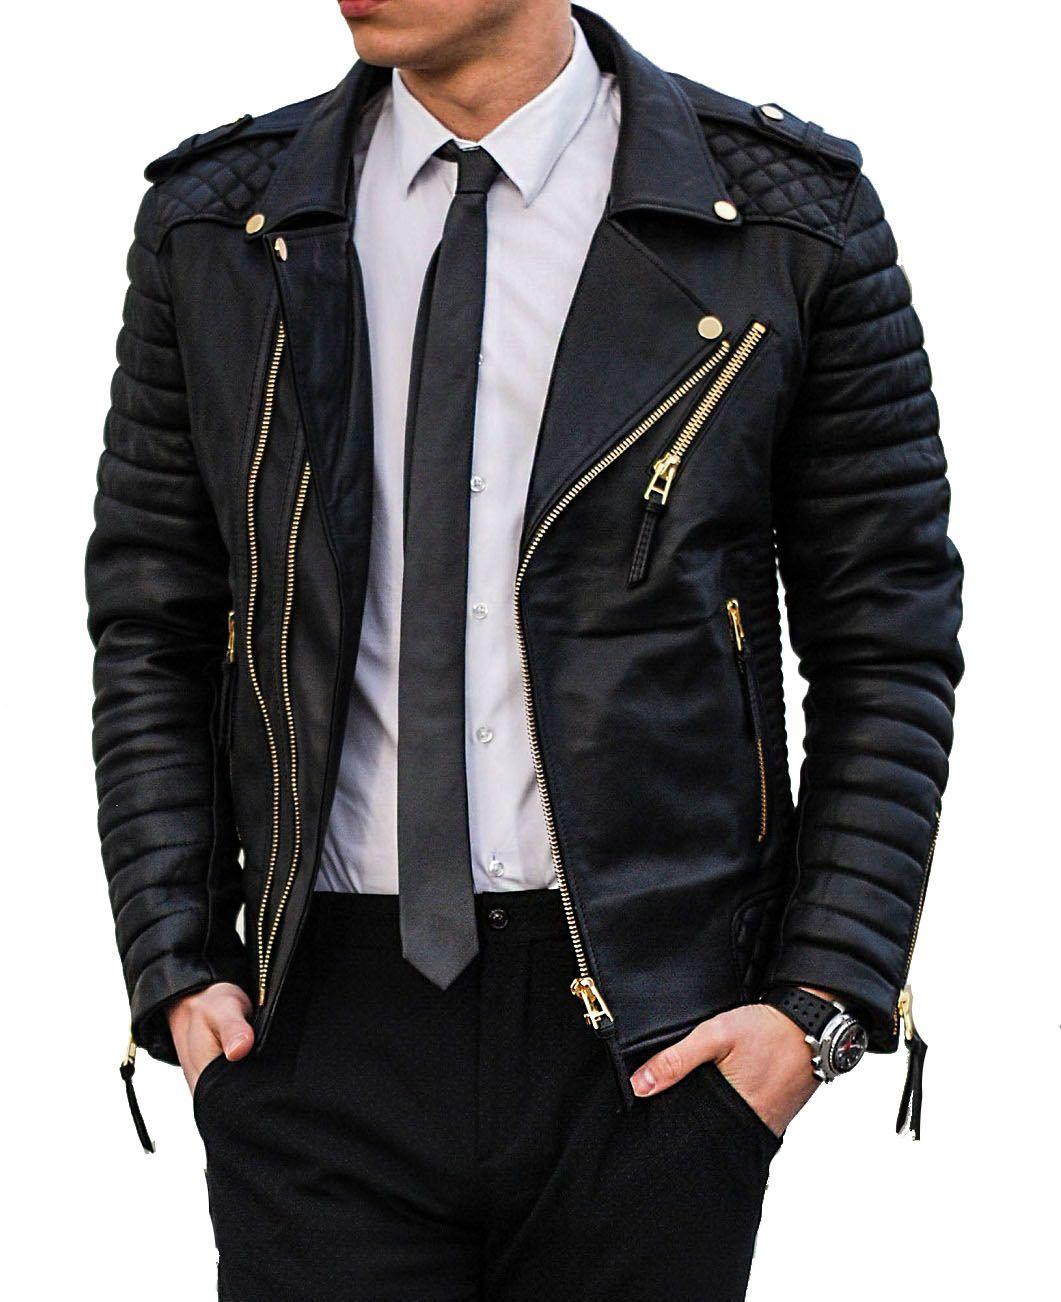 Men S Leather Jacket Stylish Handmade Motorcycle Biker Genuine Lambskin Leather Jacket Fo Leather Jacket Men Mens Leather Jacket Biker Leather Jacket Men Style [ 1302 x 1061 Pixel ]